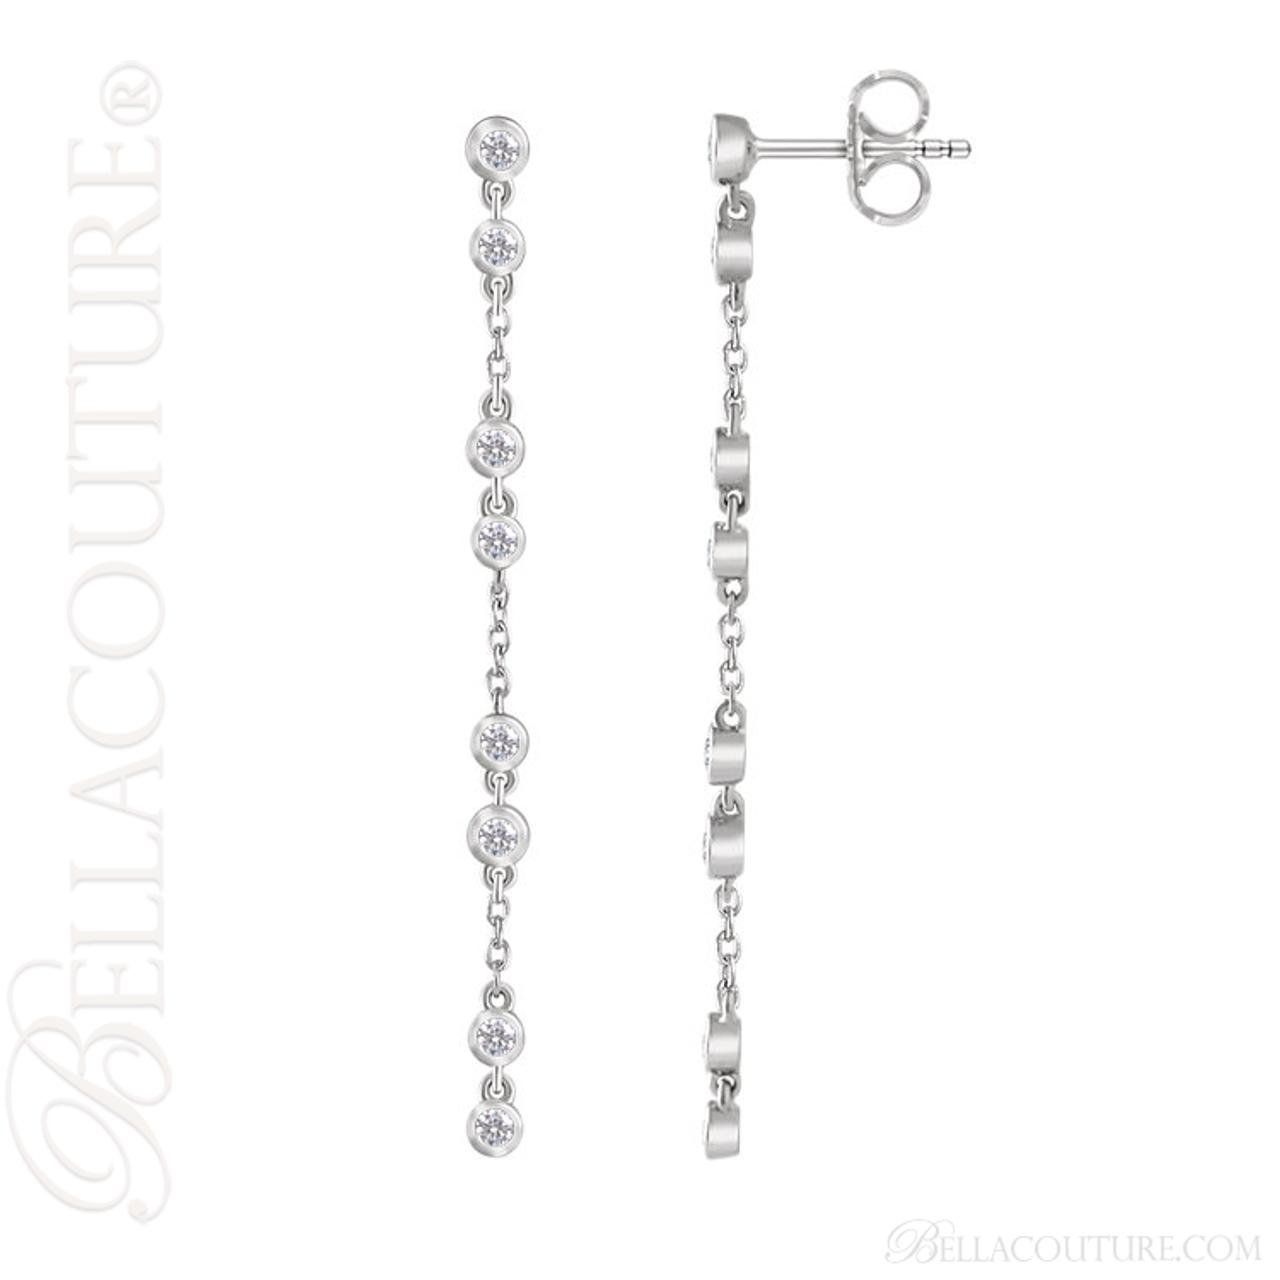 New bella couture waverly diamond 14k white gold chain dangle new bella couture waverly diamond 14k white gold chain dangle drop chandelier earrings aloadofball Gallery